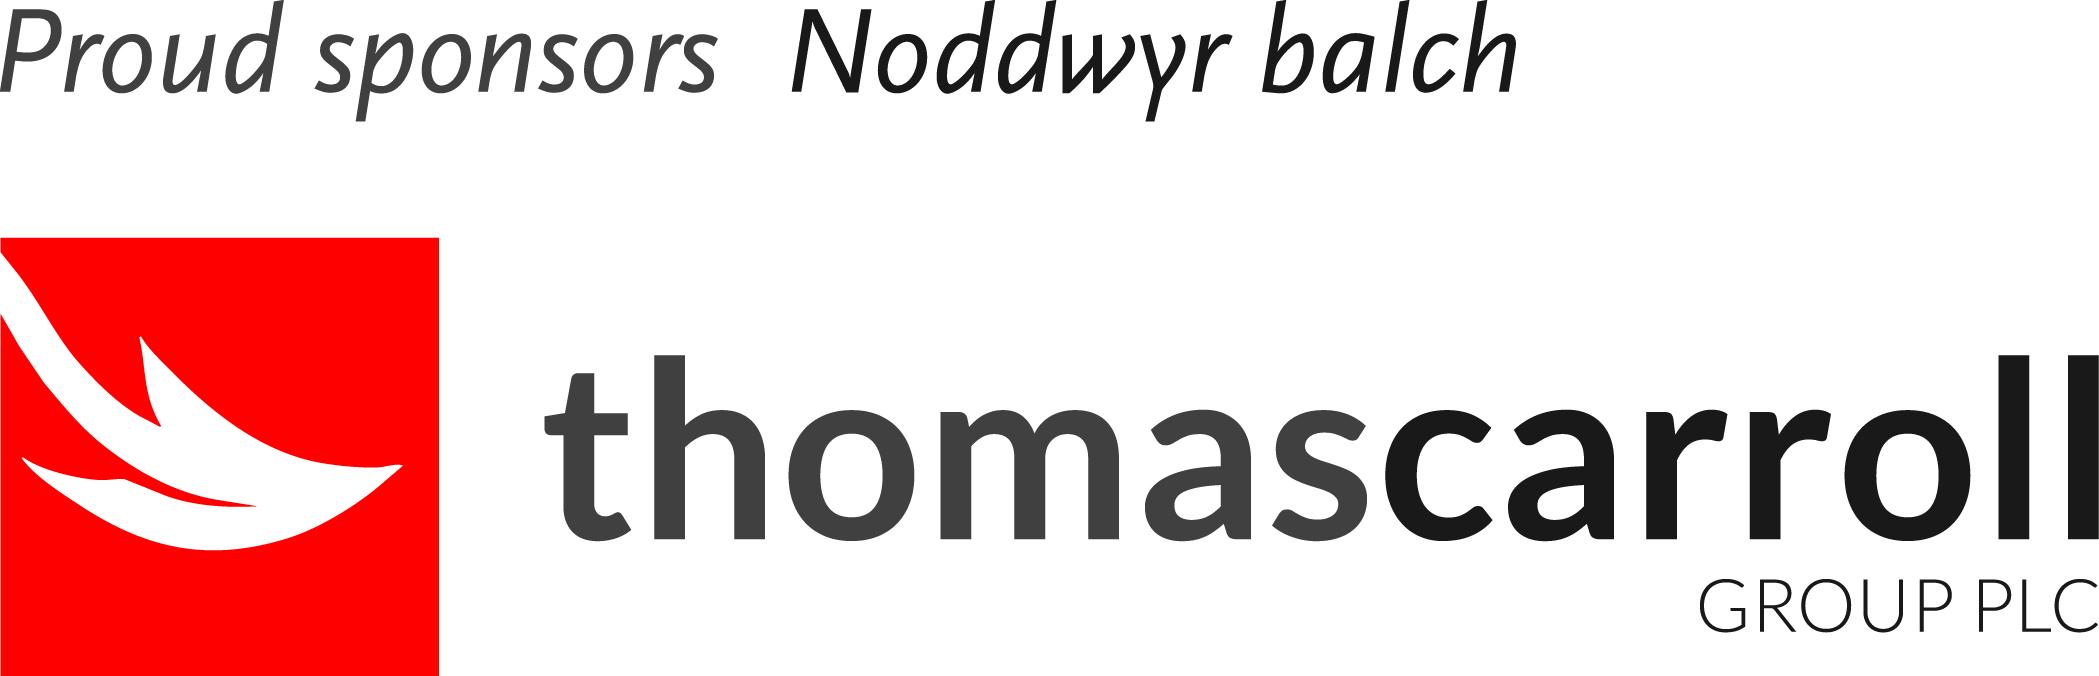 Thomas carroll proud sponsors logo